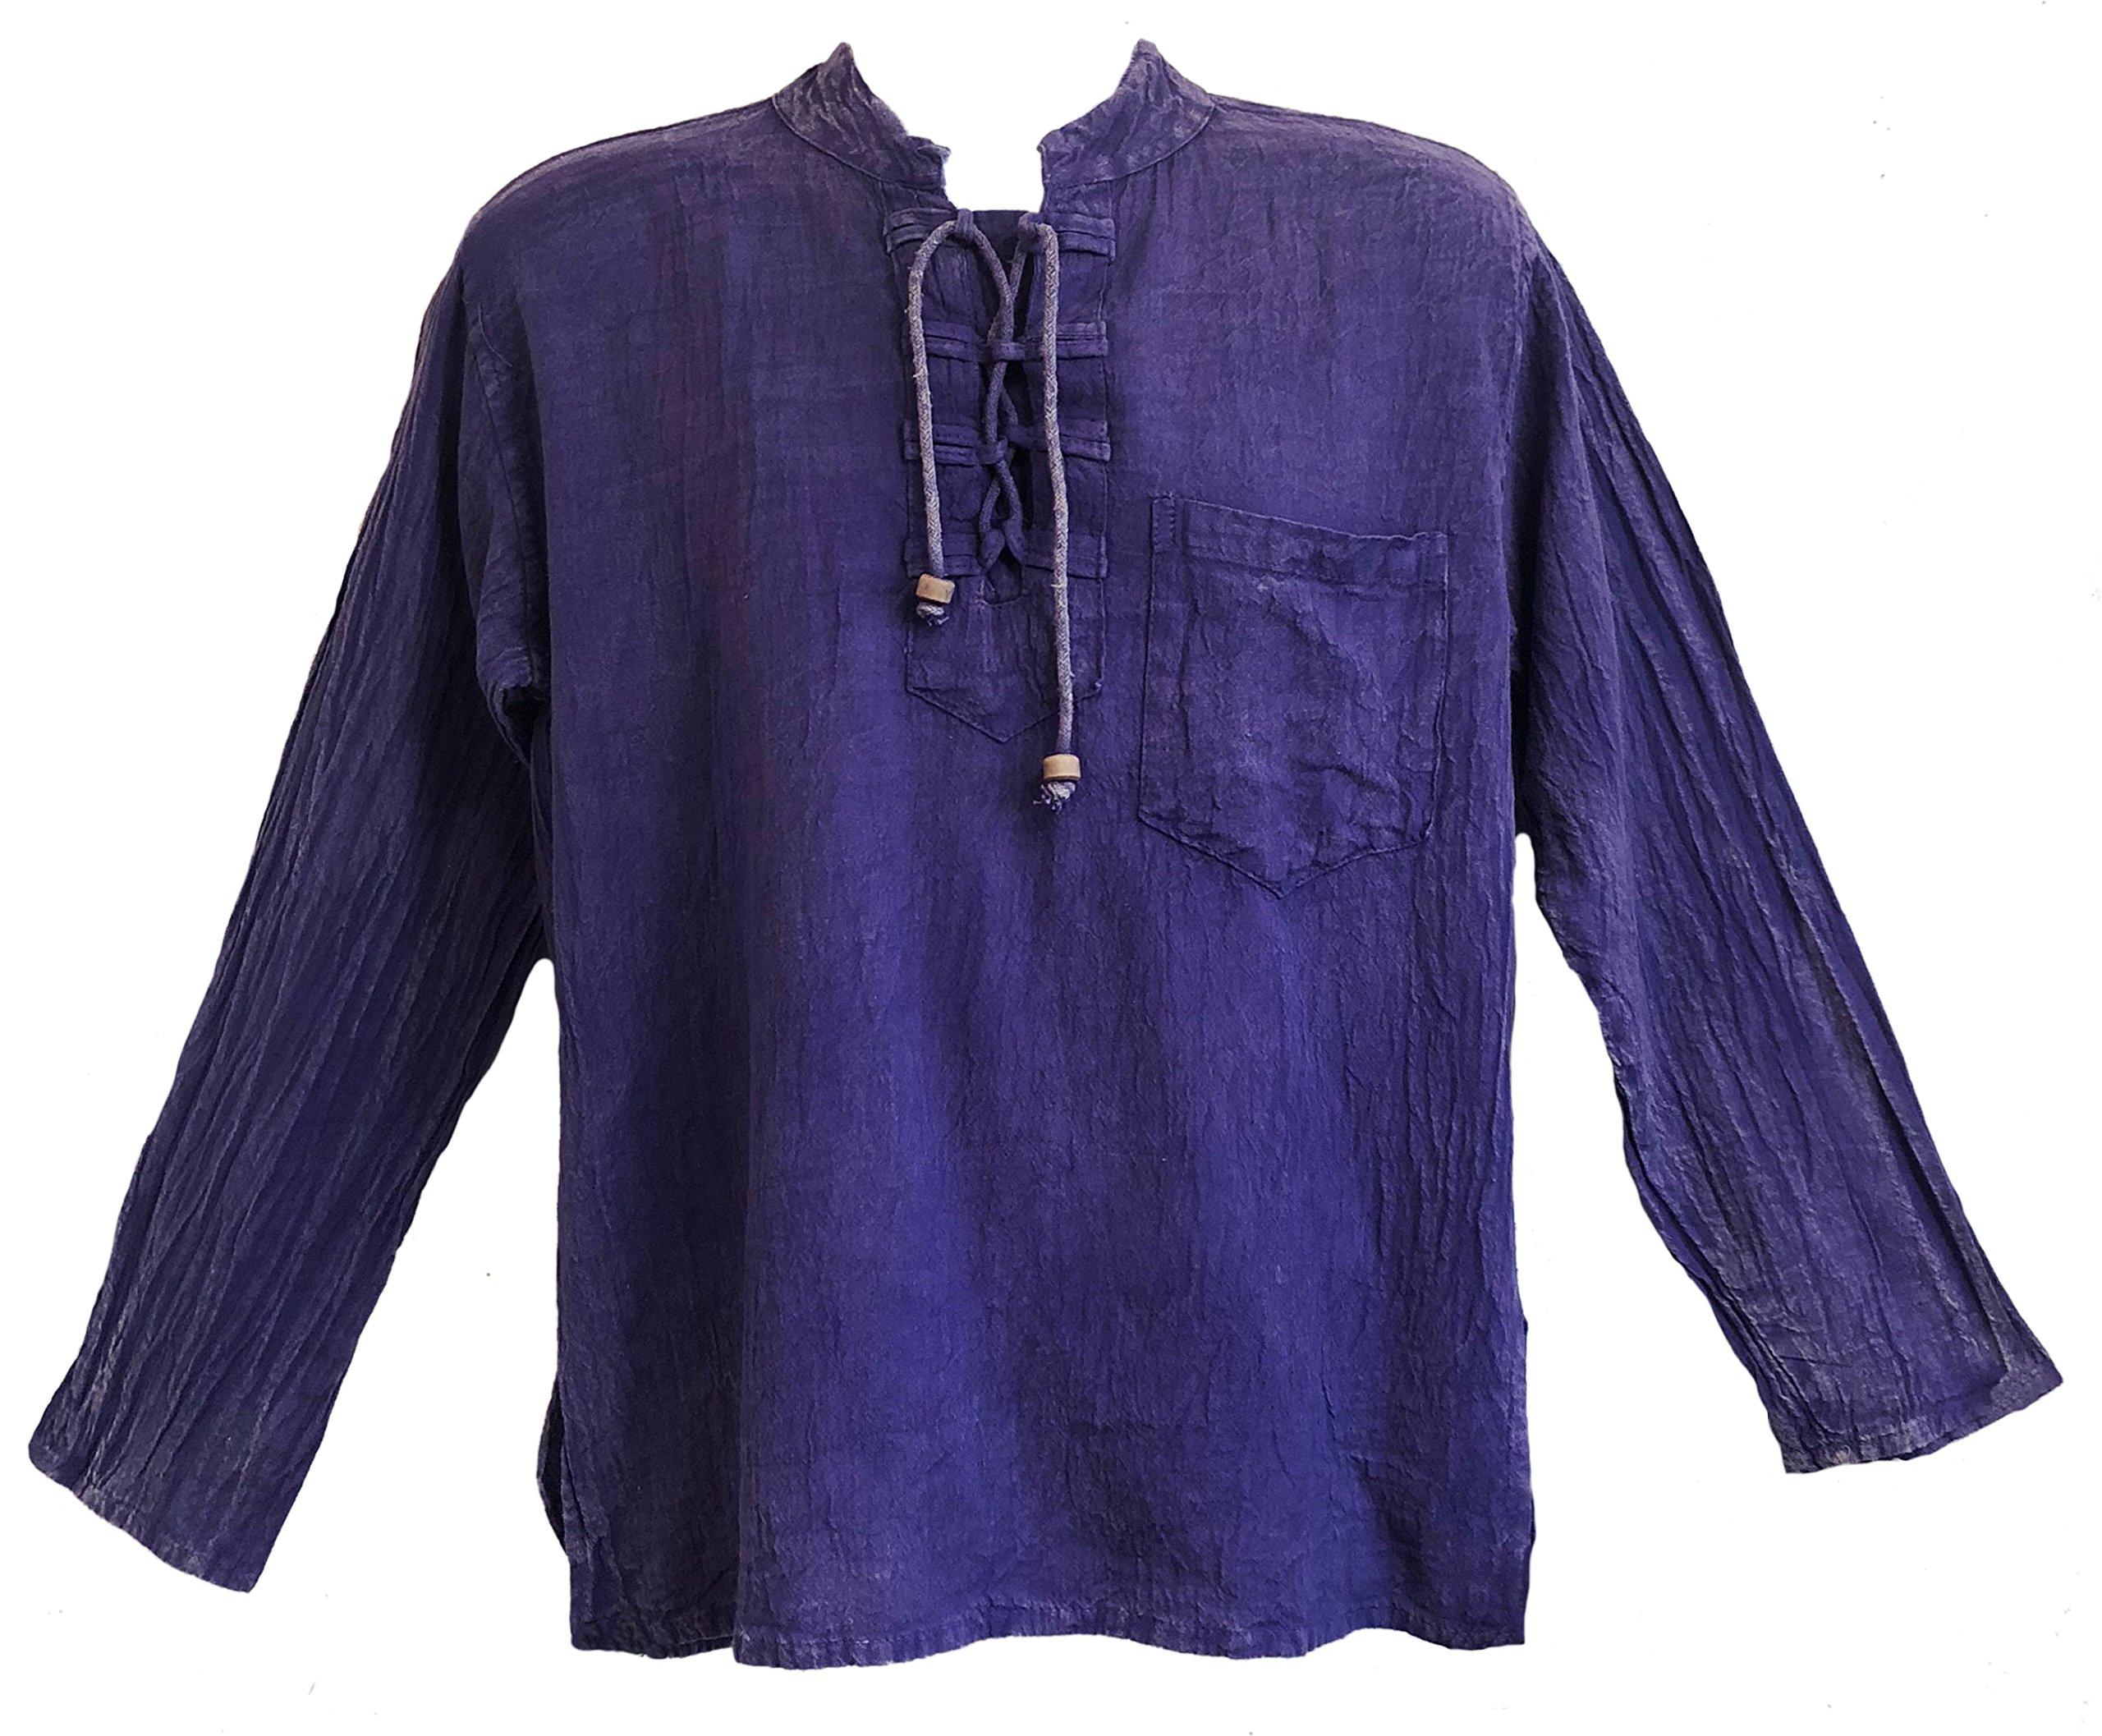 Yak & Yeti Men's Kurta Stone Washed Lightweight Cotton Embroidered Mandarin Style Collar (Medium, Purple Lace up)